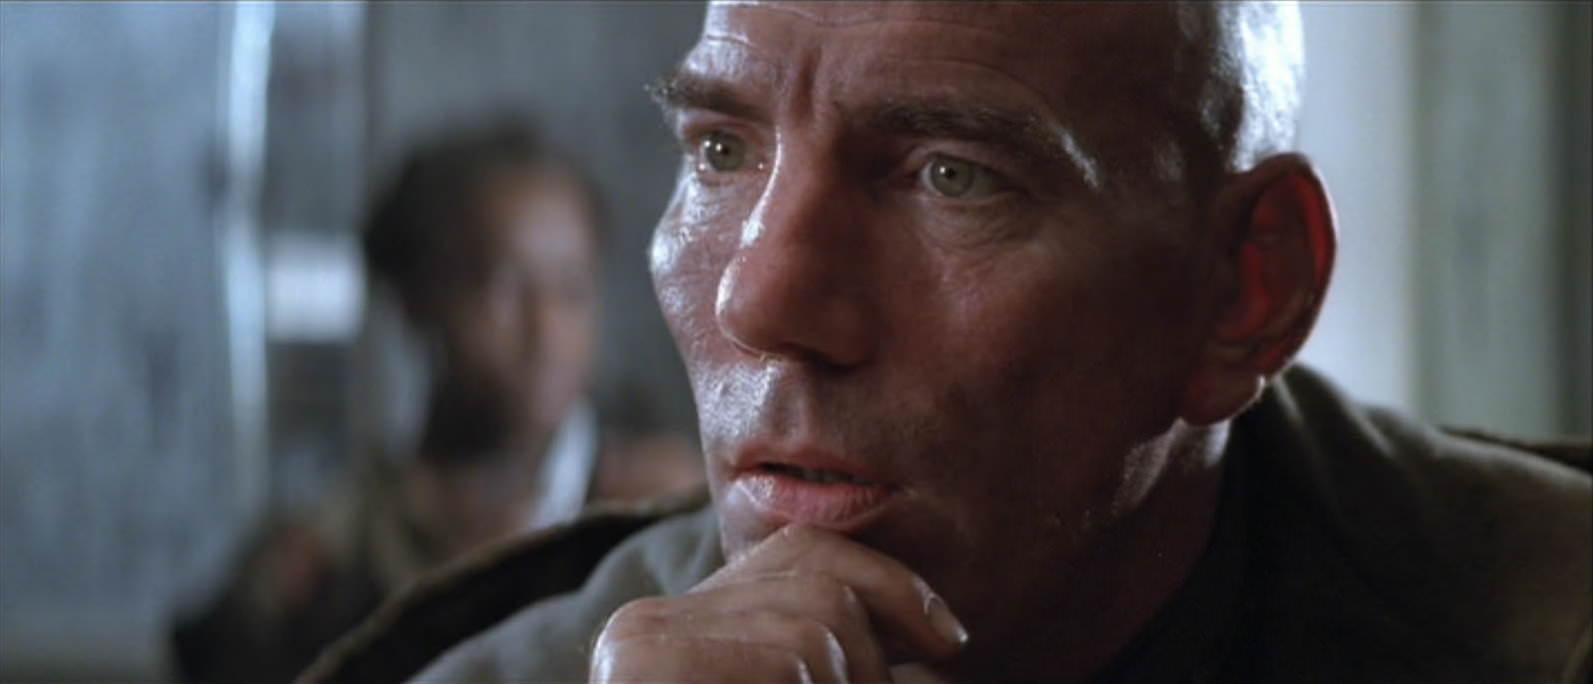 Movie, Alien³(美國, 1992年) / 異形3(台灣), 電影角色與演員介紹